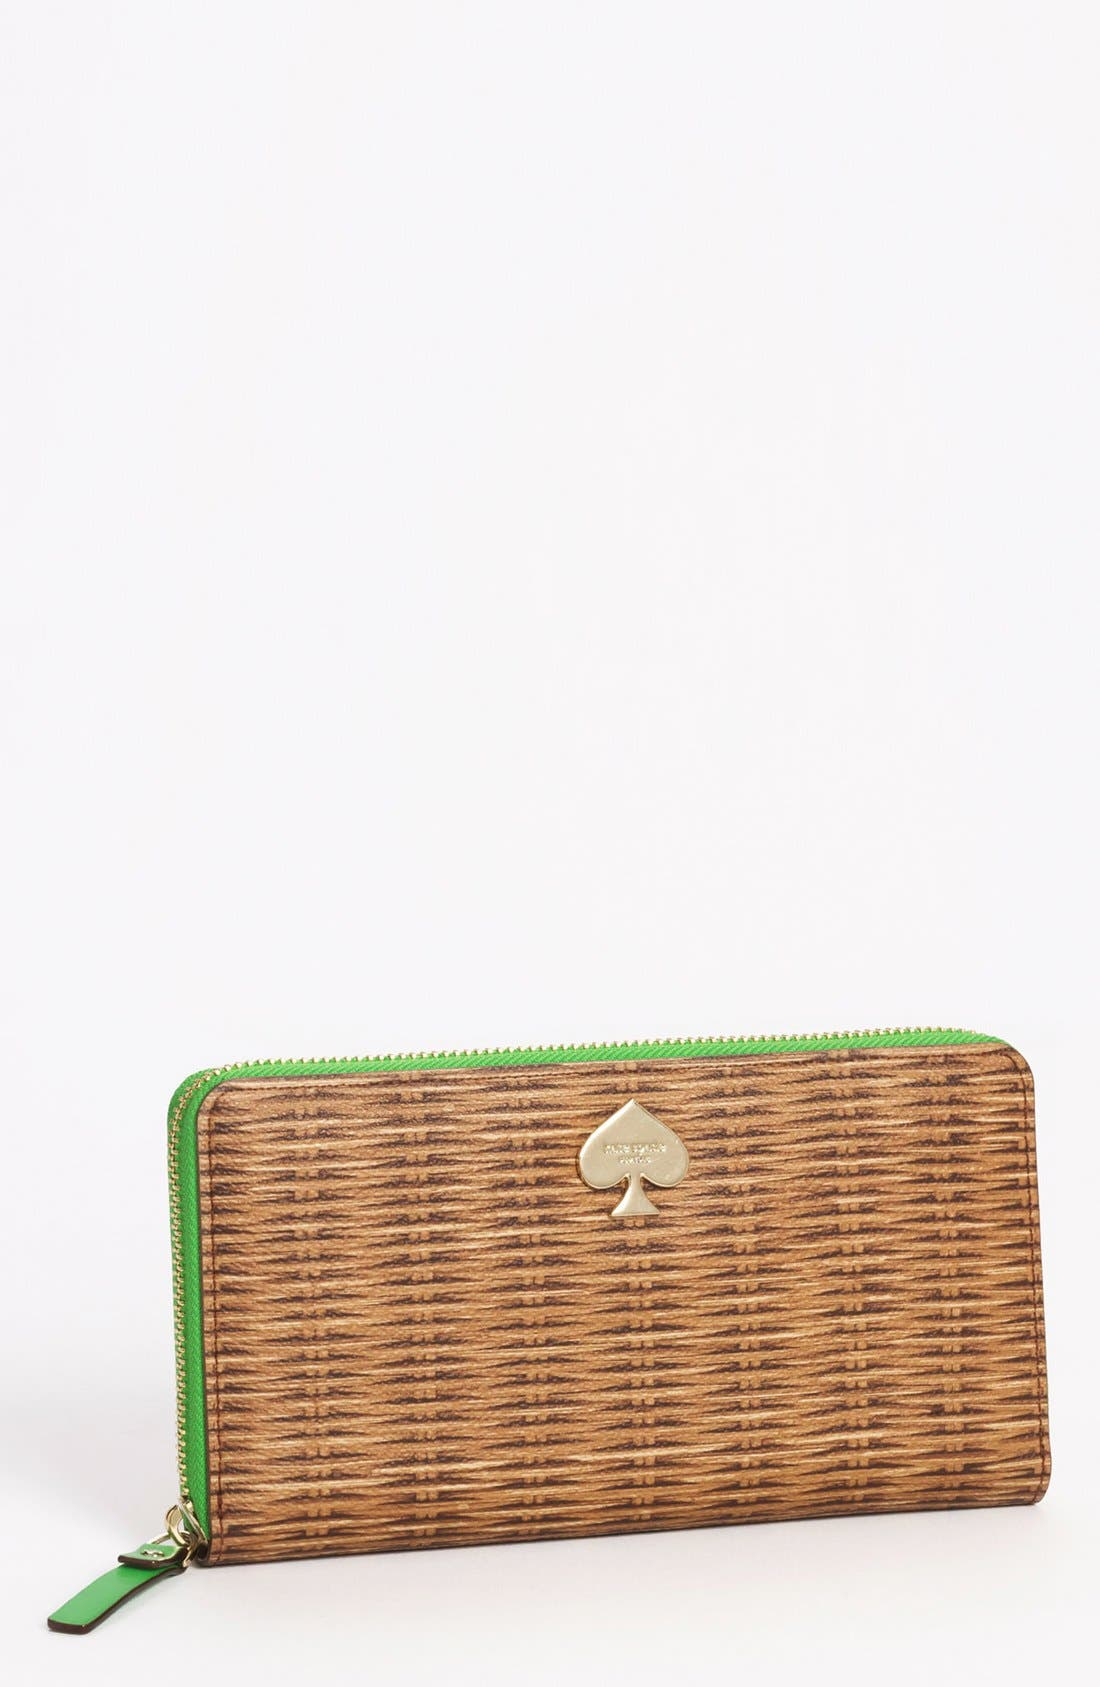 Main Image - kate spade new york 'pack a picnic - lacey' wallet